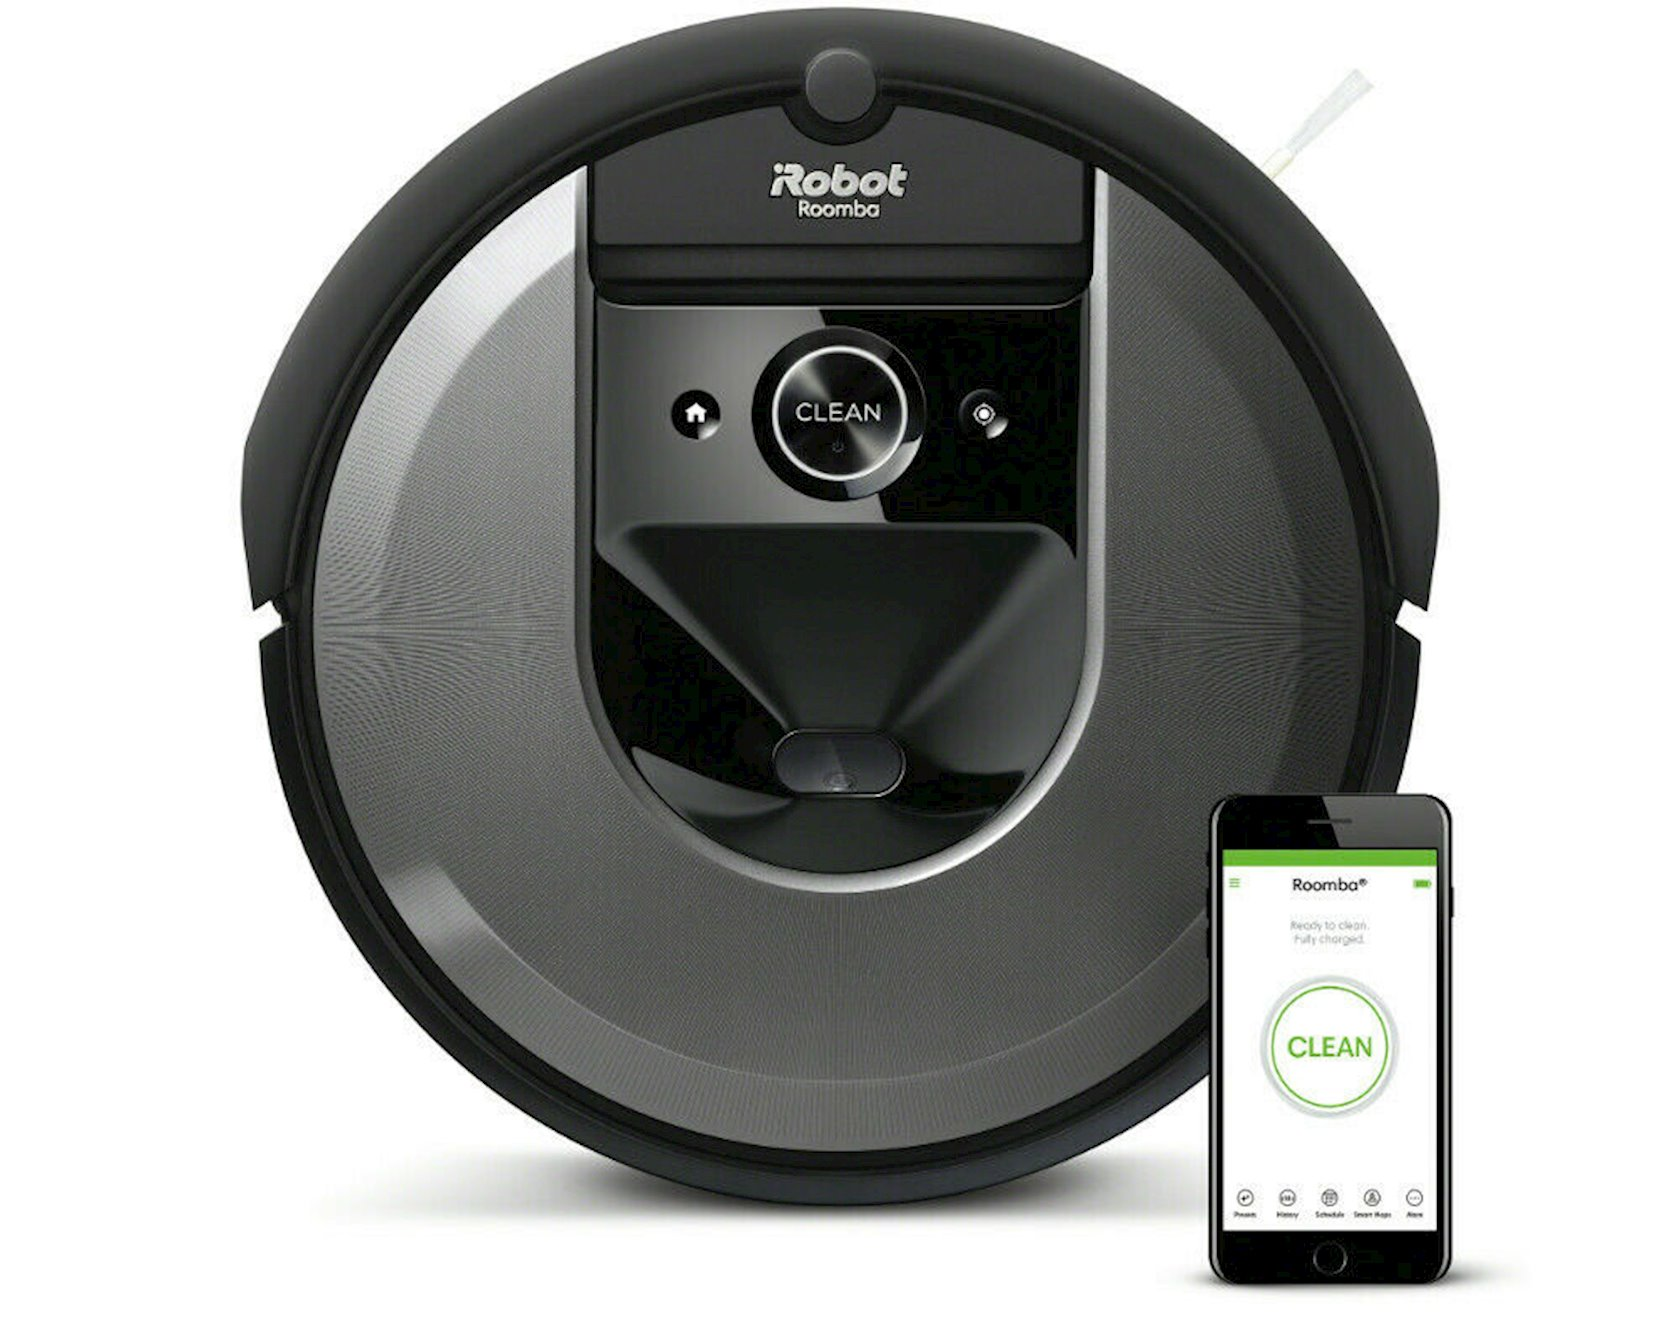 Robot tozsoran iRobot Roomba i7